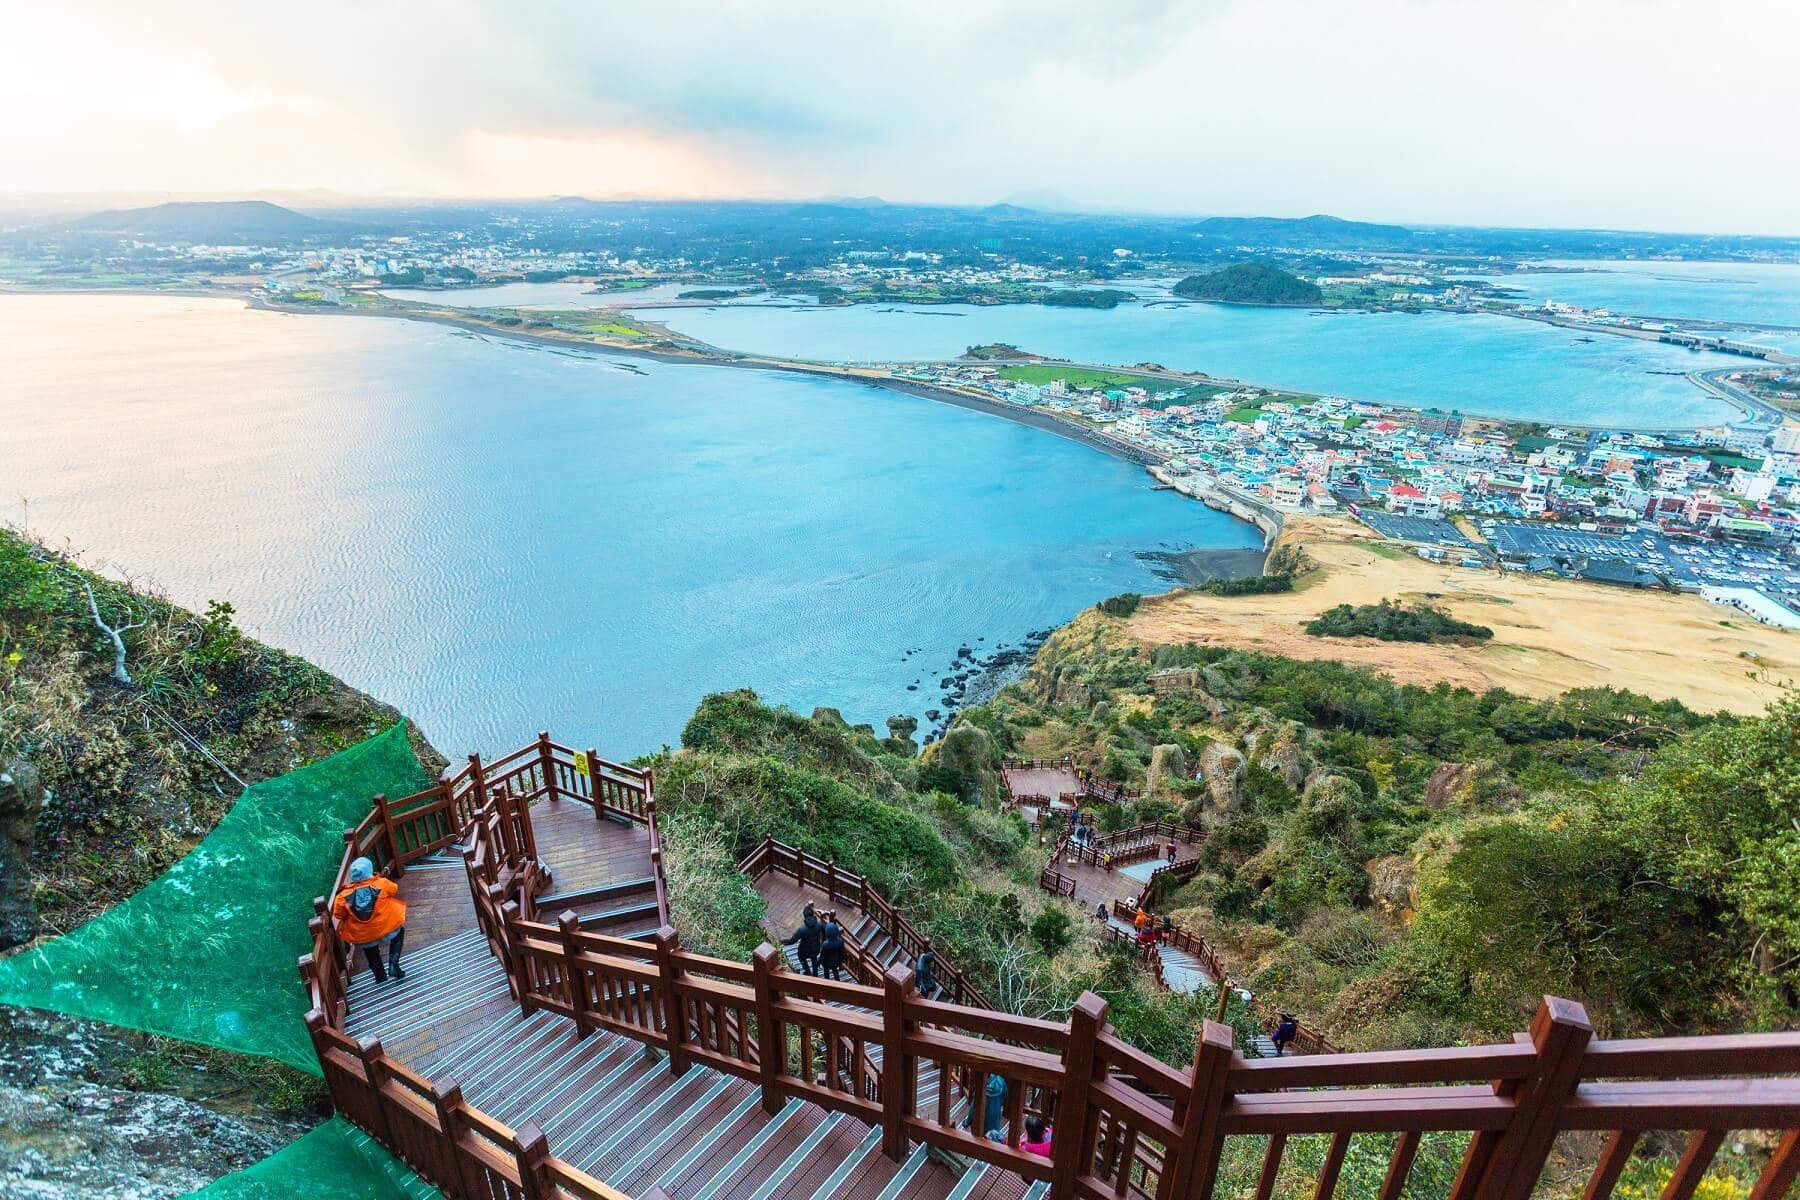 Jeju Islands: The Beautiful Island of the Gods